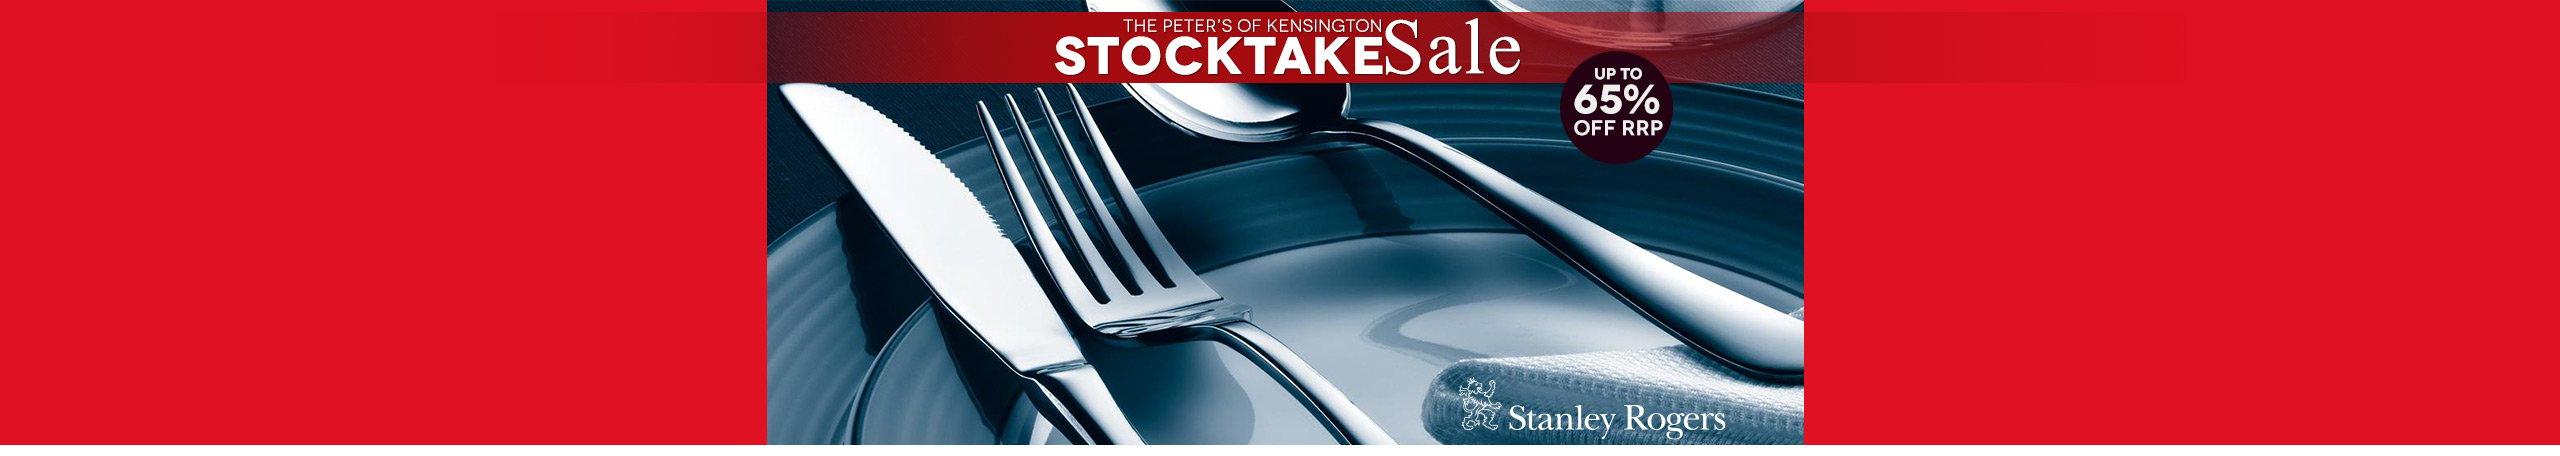 Stocktake Sale Stanley Rogers Cutlery